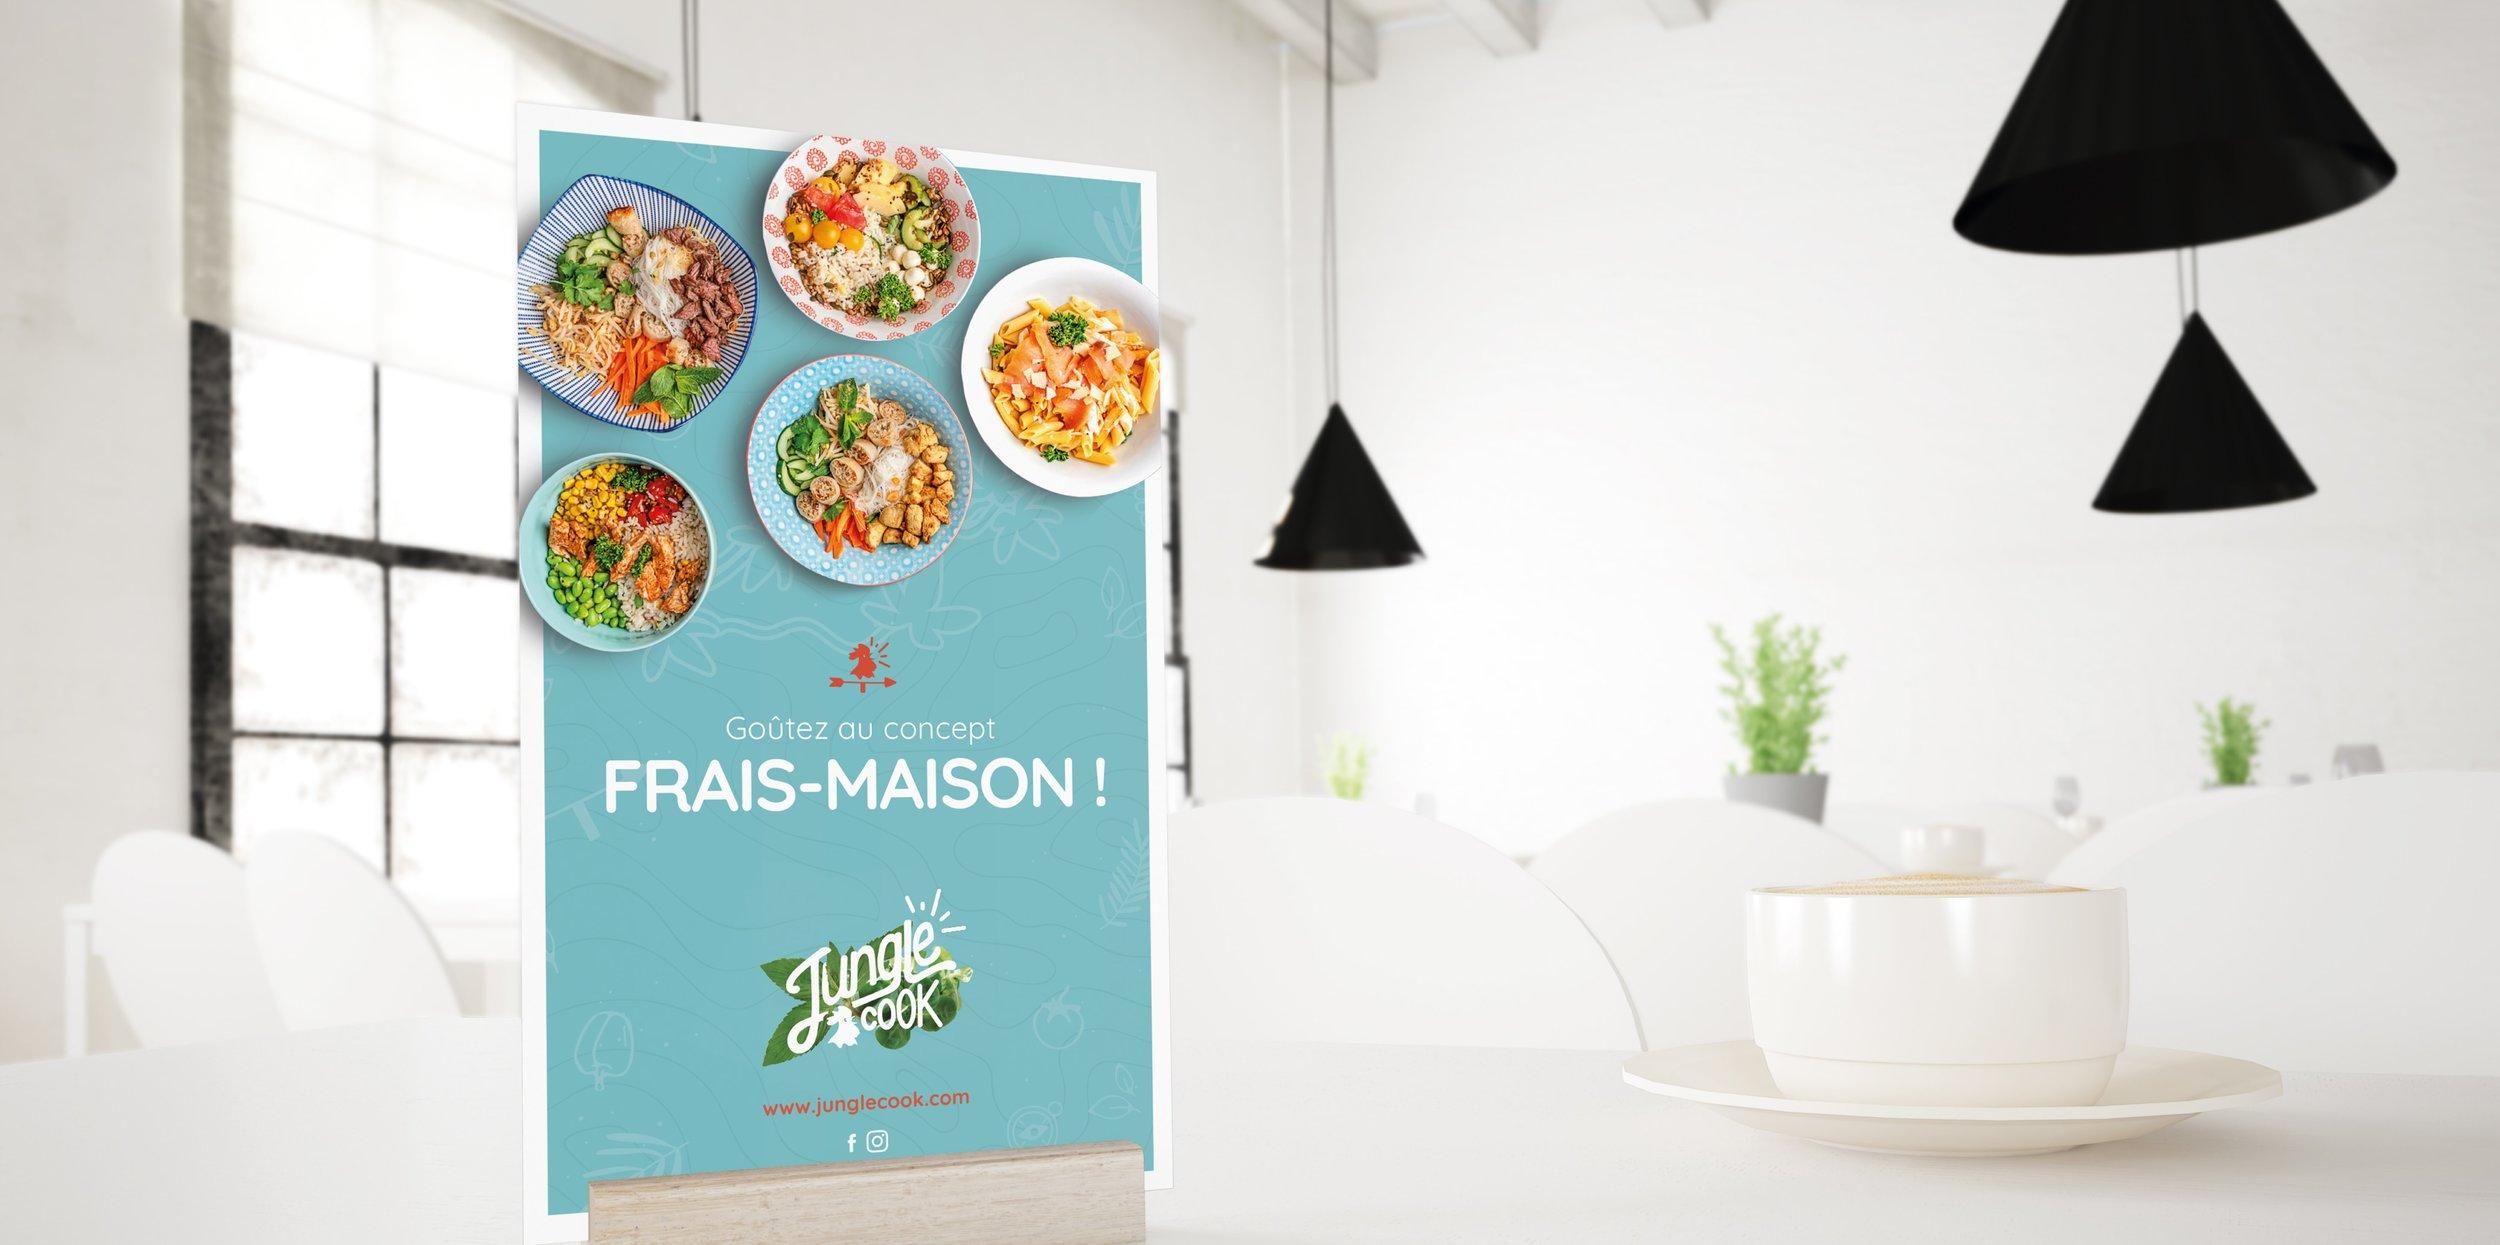 jungle_cook_6-flyer_presentation_plat_bureau.jpg